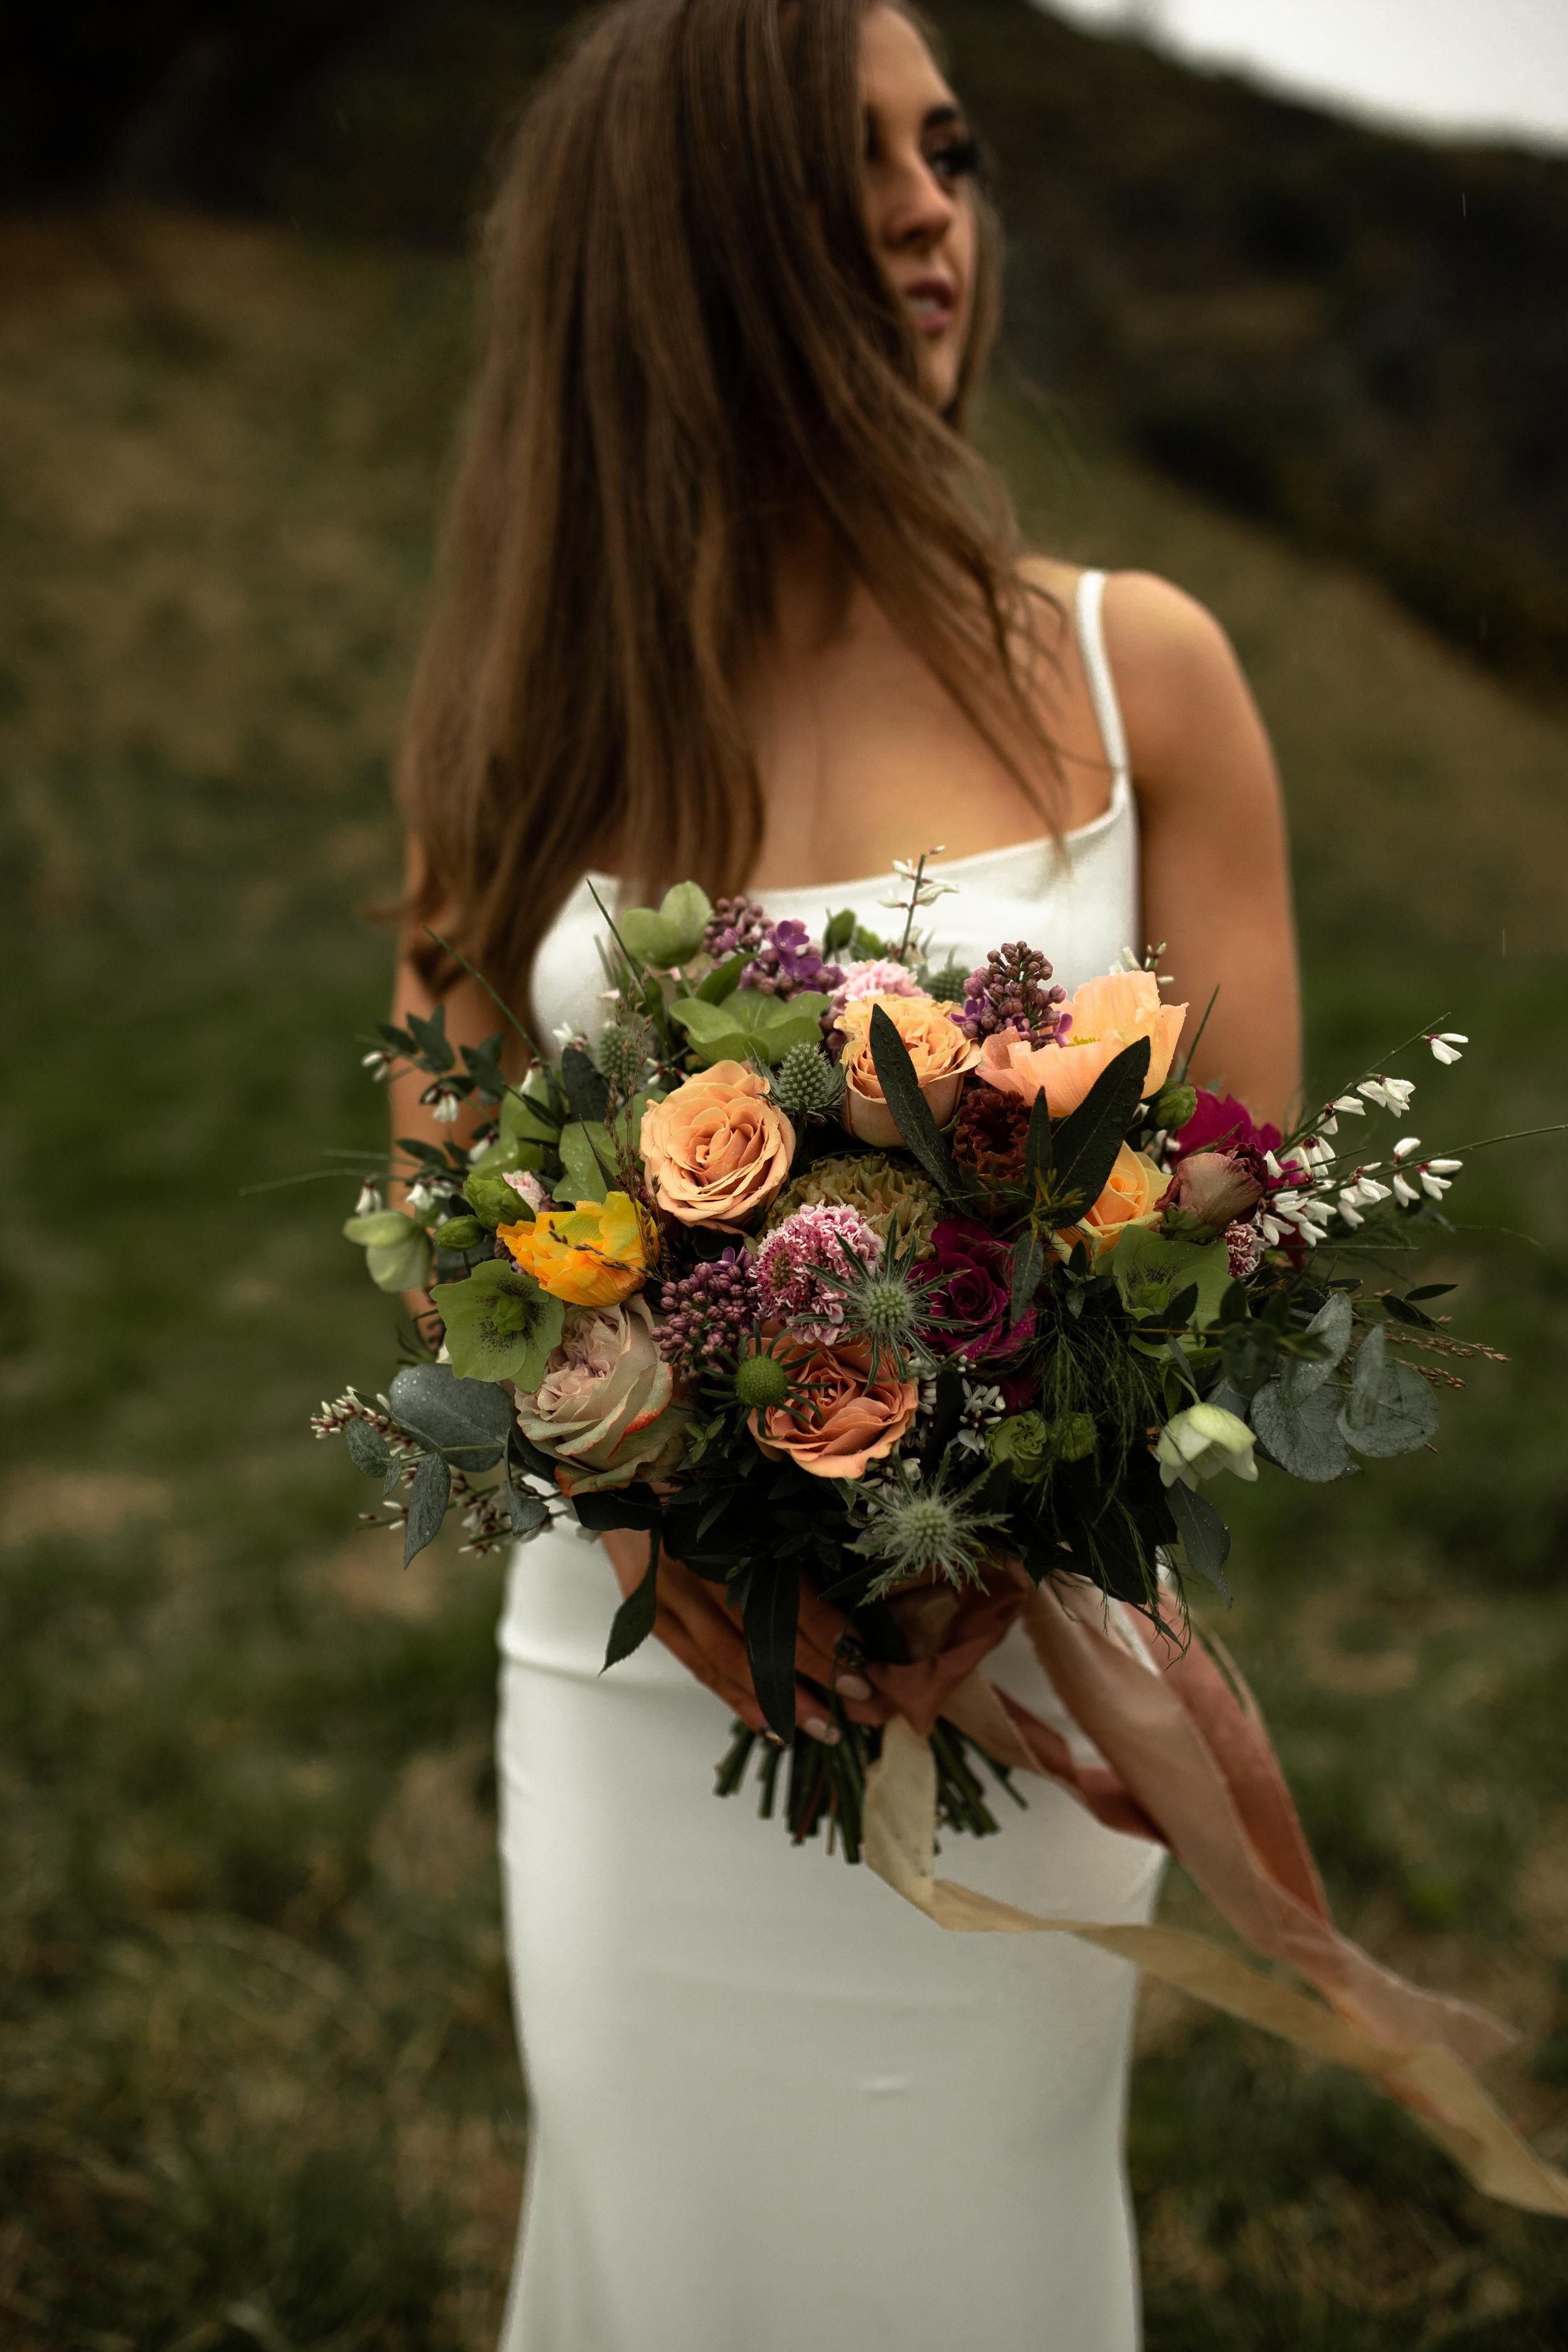 Paula_Russell_Photography_Edinburgh_Wedding_BBonnie_Flowers_7